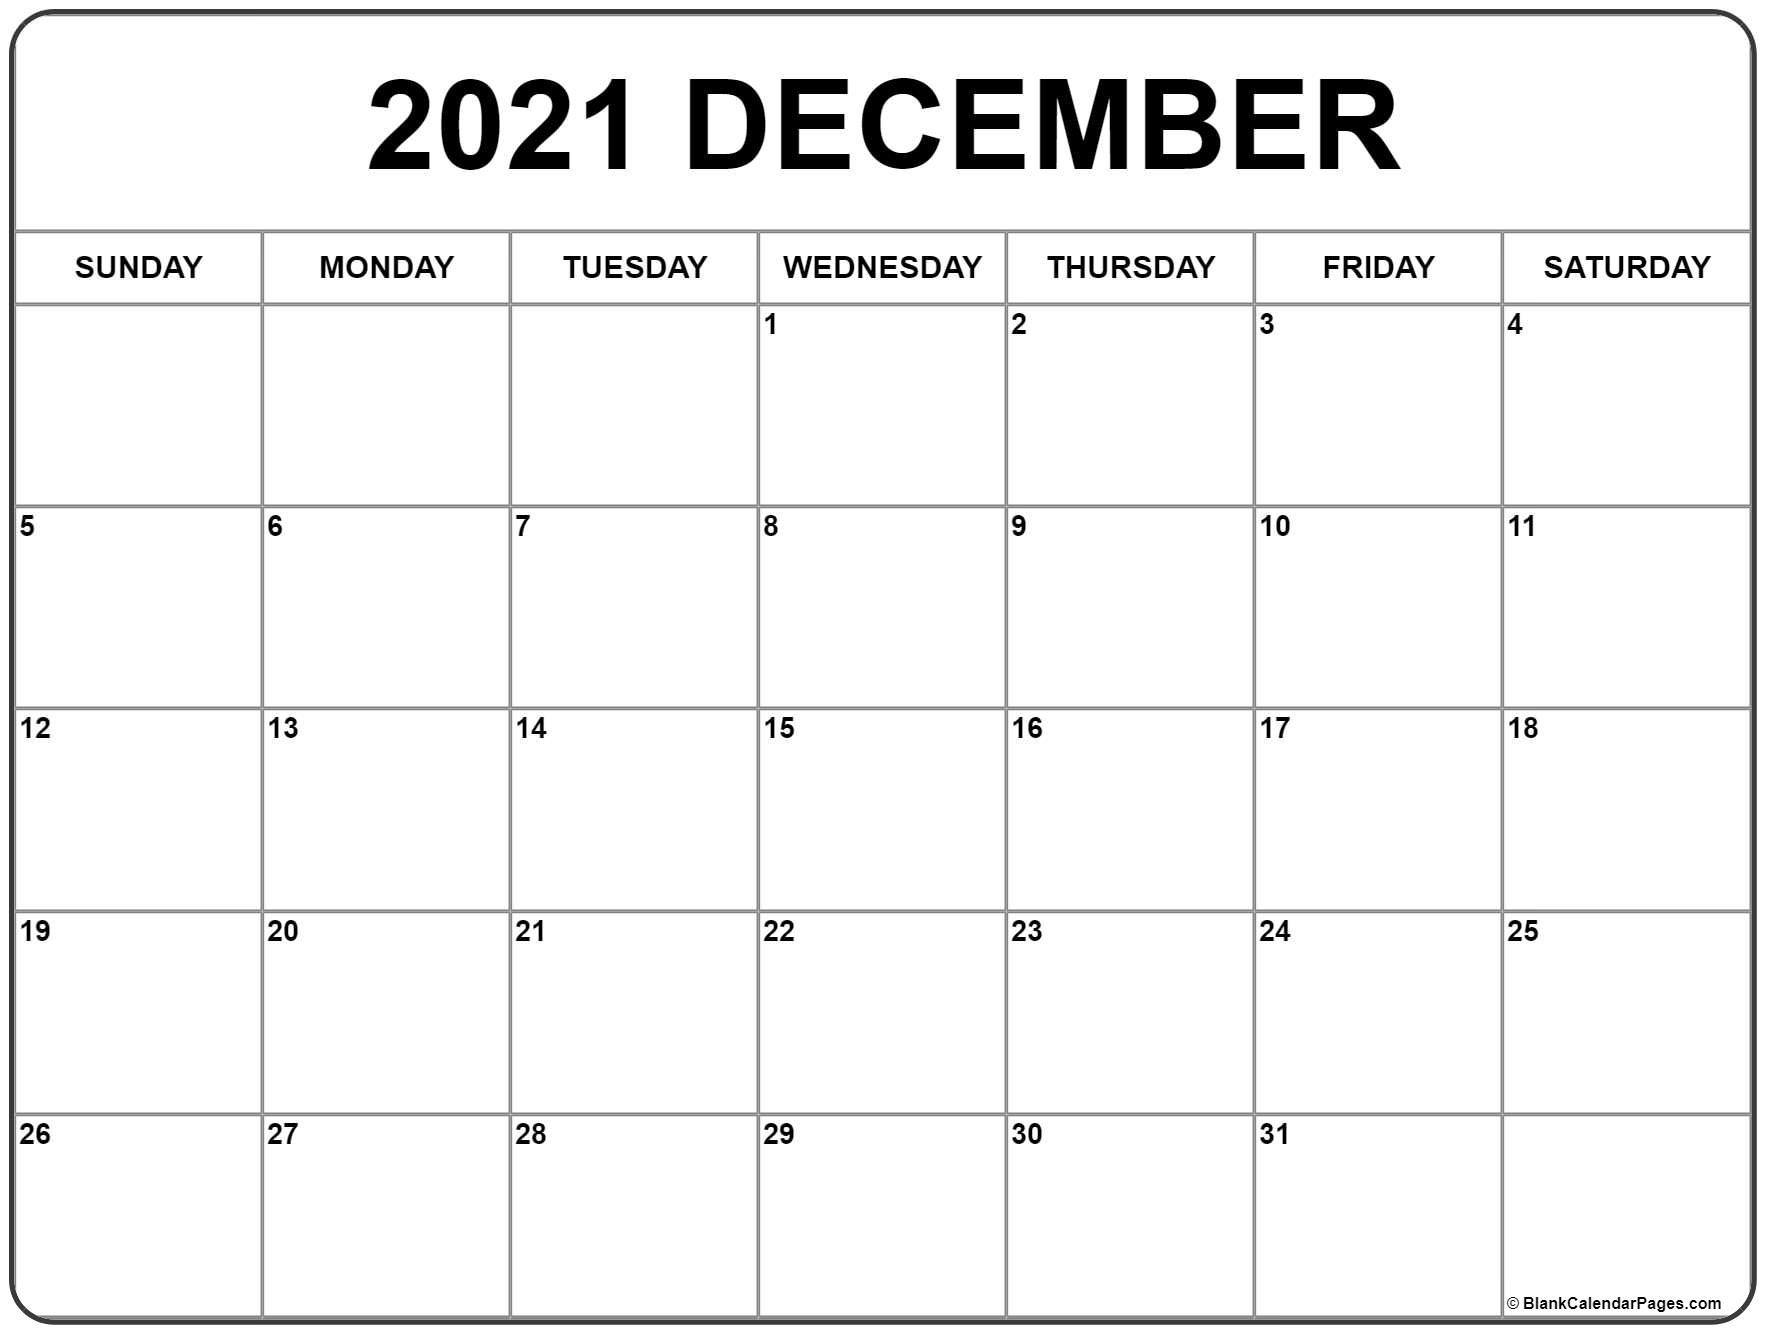 Free Whimsical Christmas Theme 2021 December Printable Calendar Free Printable Monthly Calendar December 2021 Calendar Printables September Calendar Monthly Calendar Printable